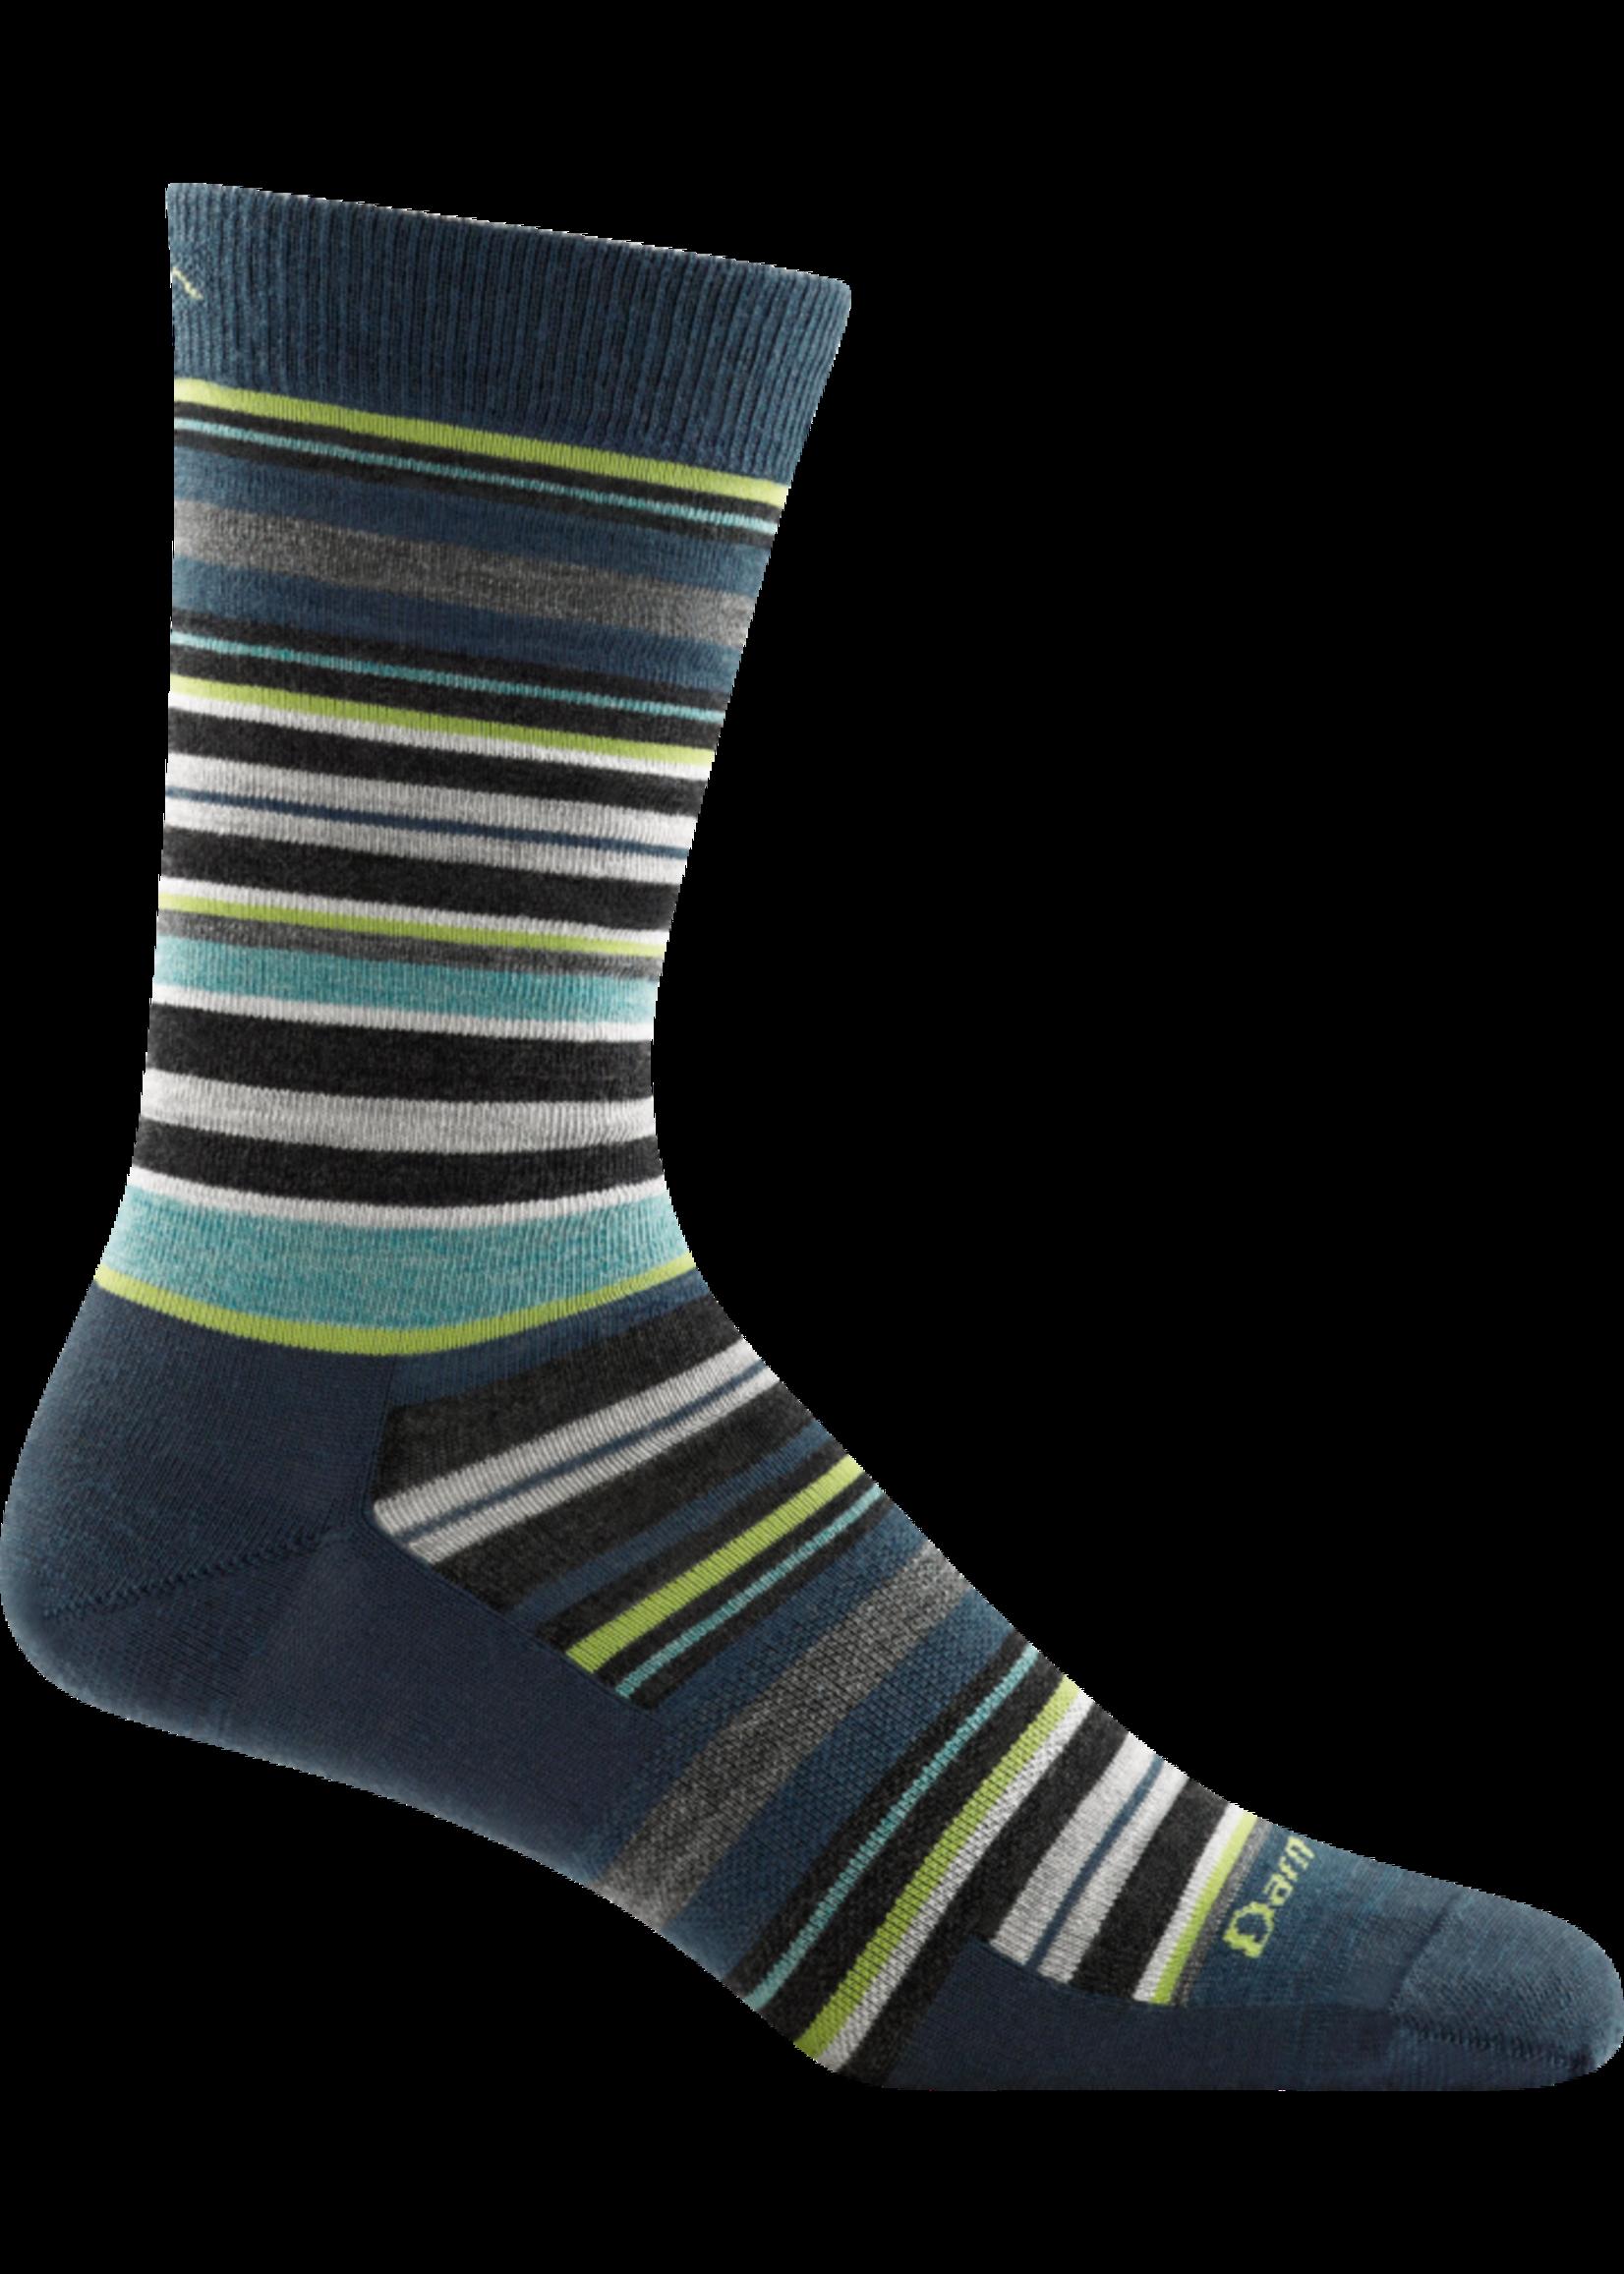 Darn Tough Men's Static Crew Lightweight Lifestyle Sock